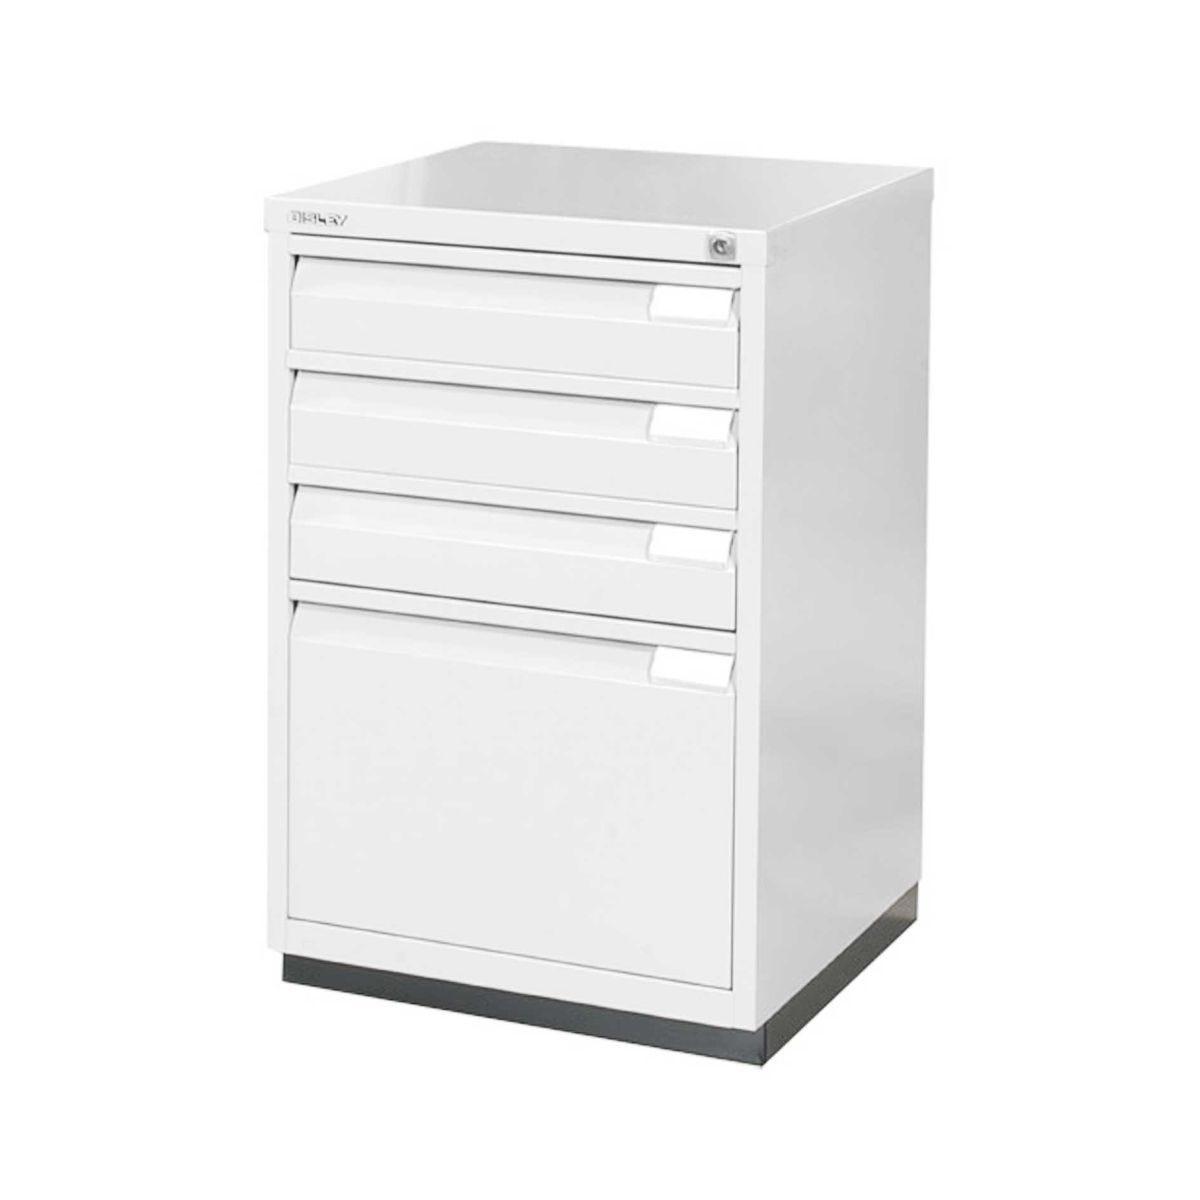 Bisley Filing Cabinet 1F3E Steel, Chalk White